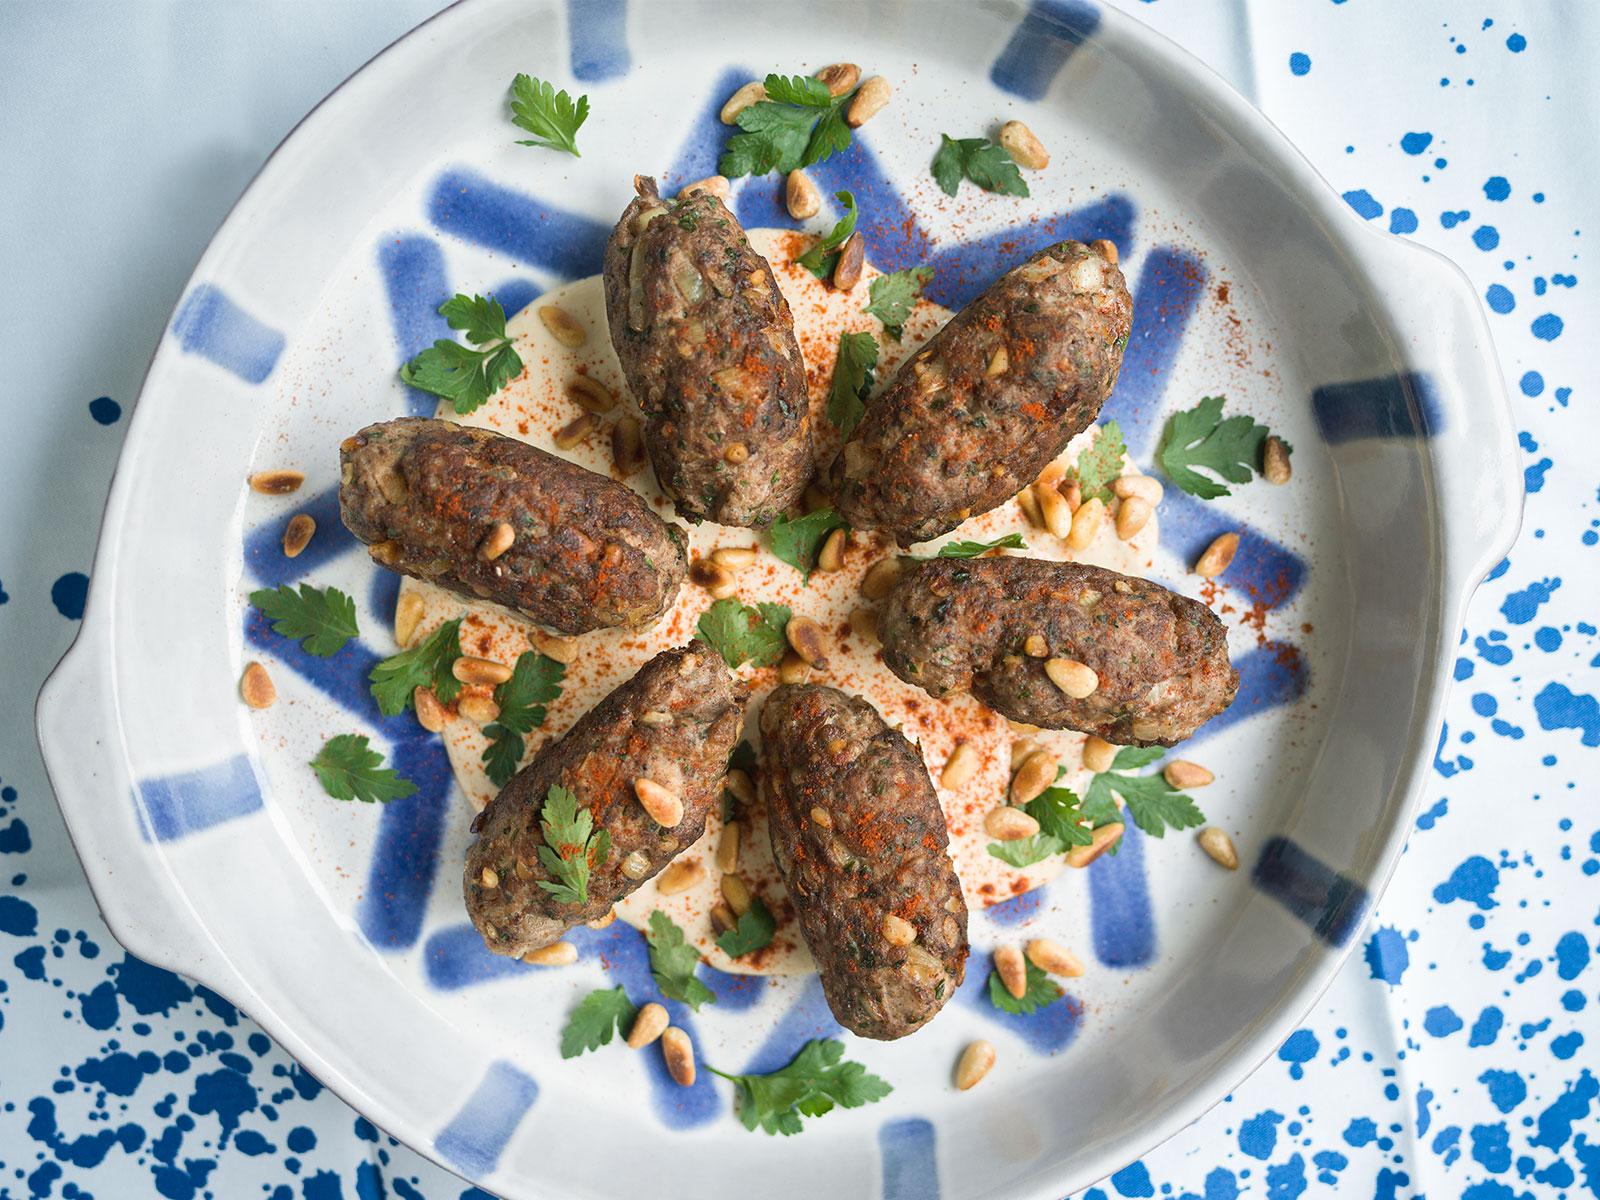 Kofta B'siniyah | recipe by Yotam Ottolenghi & Sami Tamimi